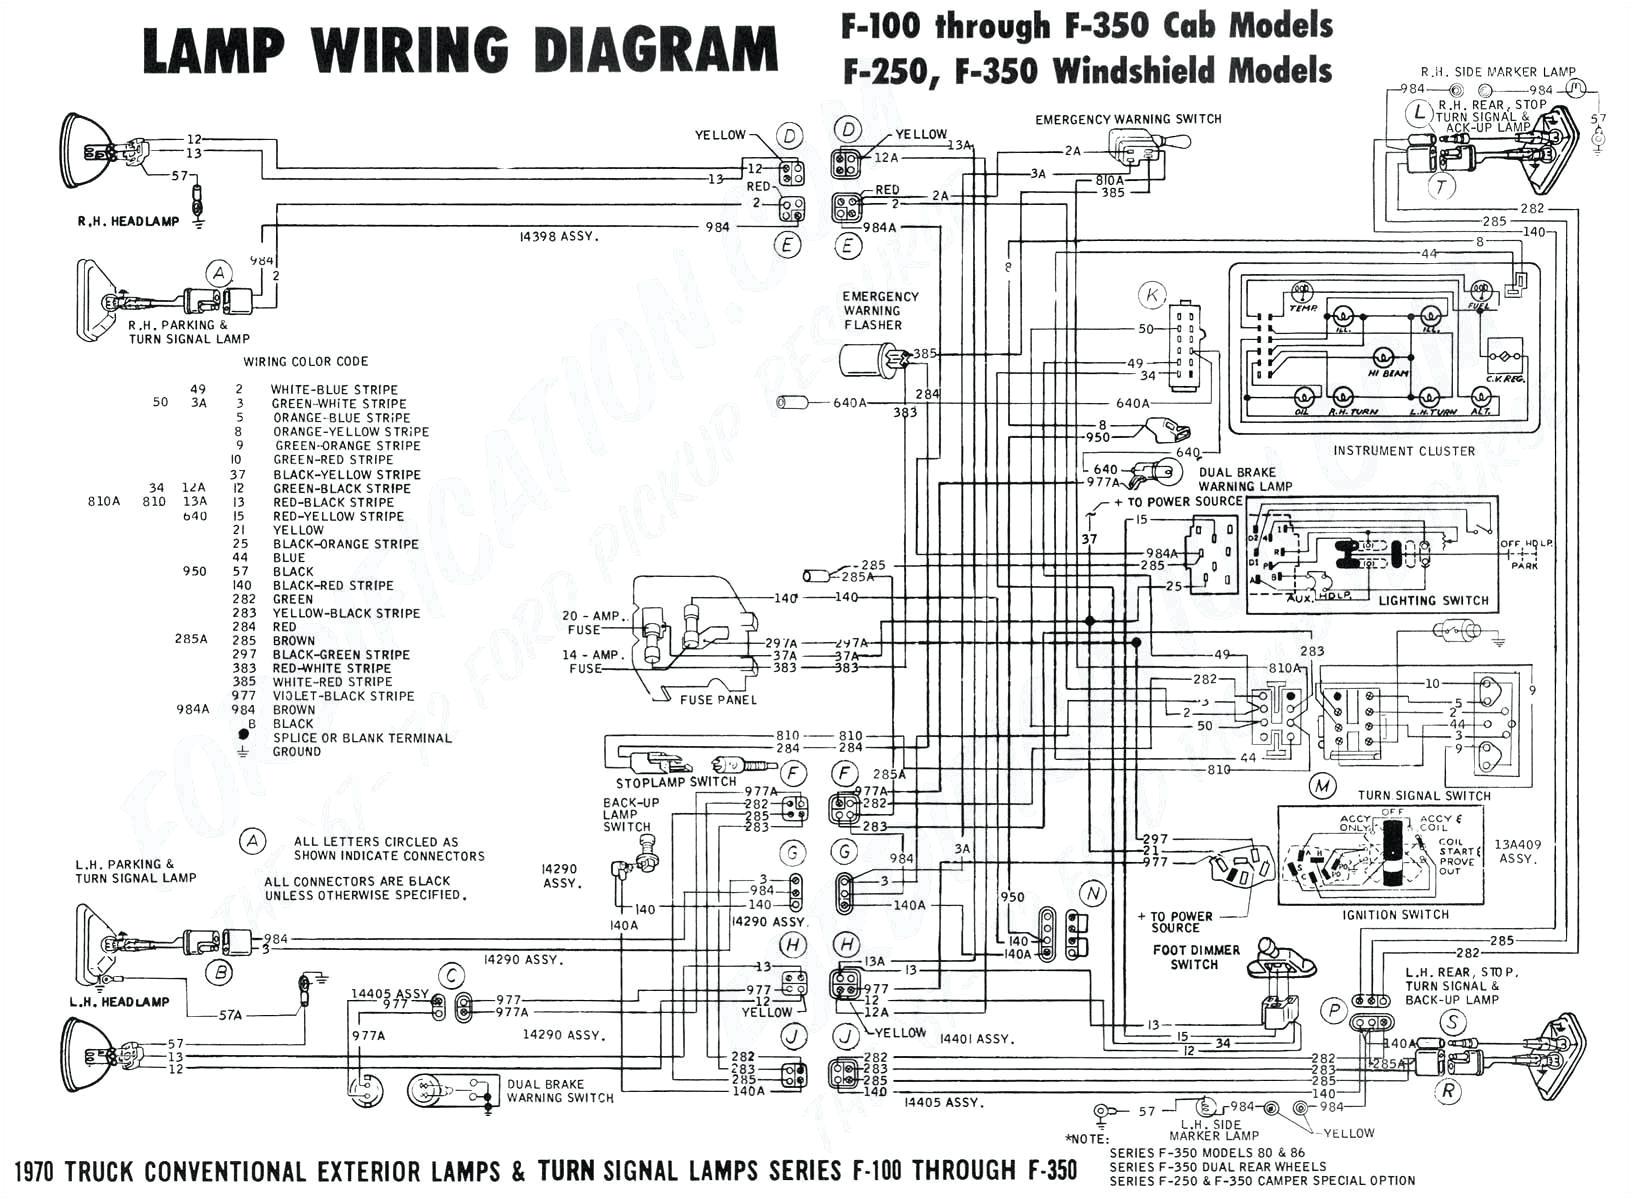 saab 9 3 audio wiring diagram wiring diagram centre saab 9 3 audio wiring diagram wiring